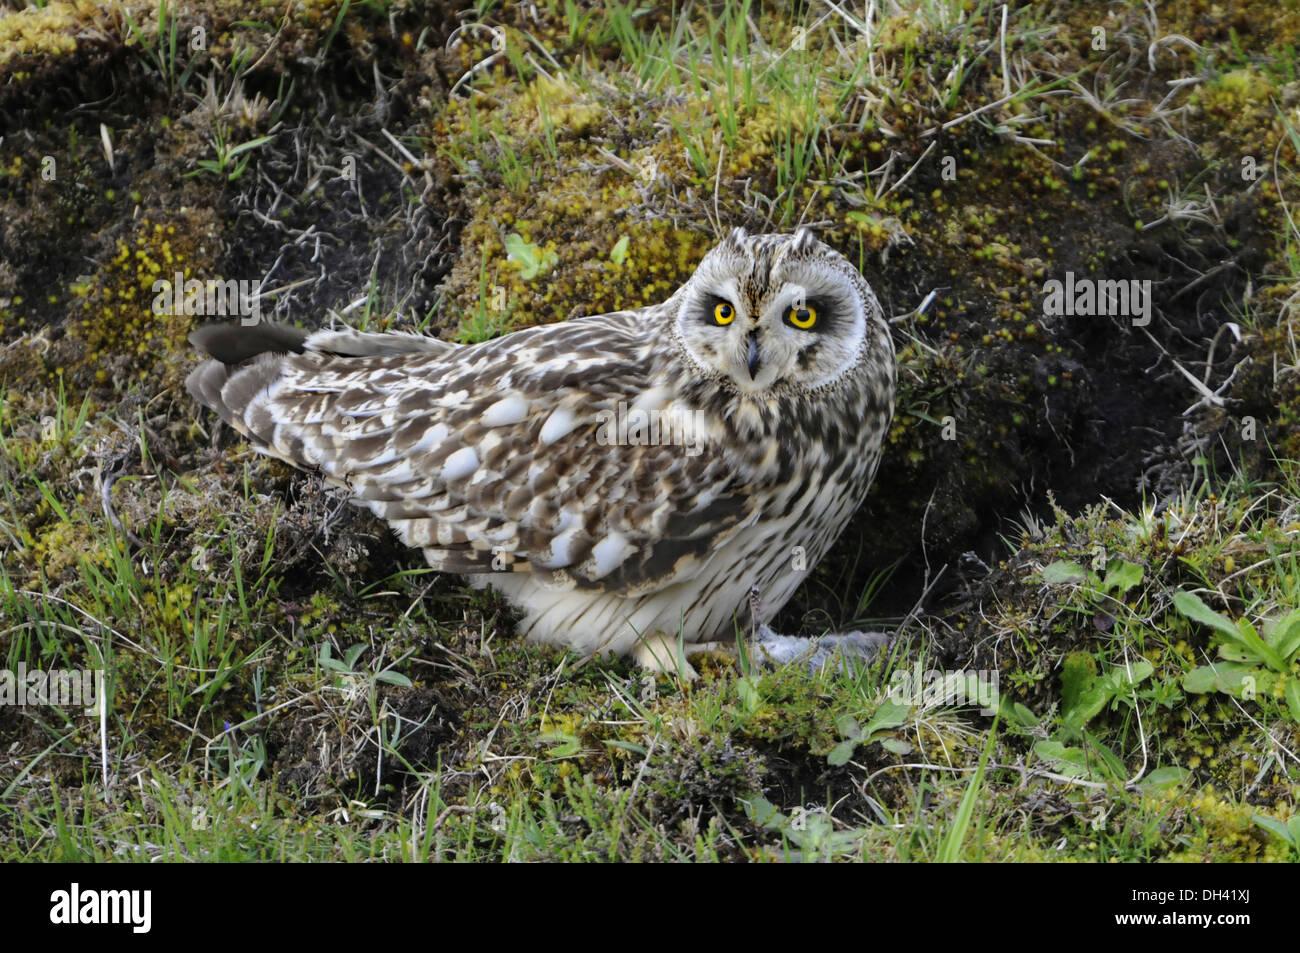 Short-eared Owl Asio flammeus - Stock Image